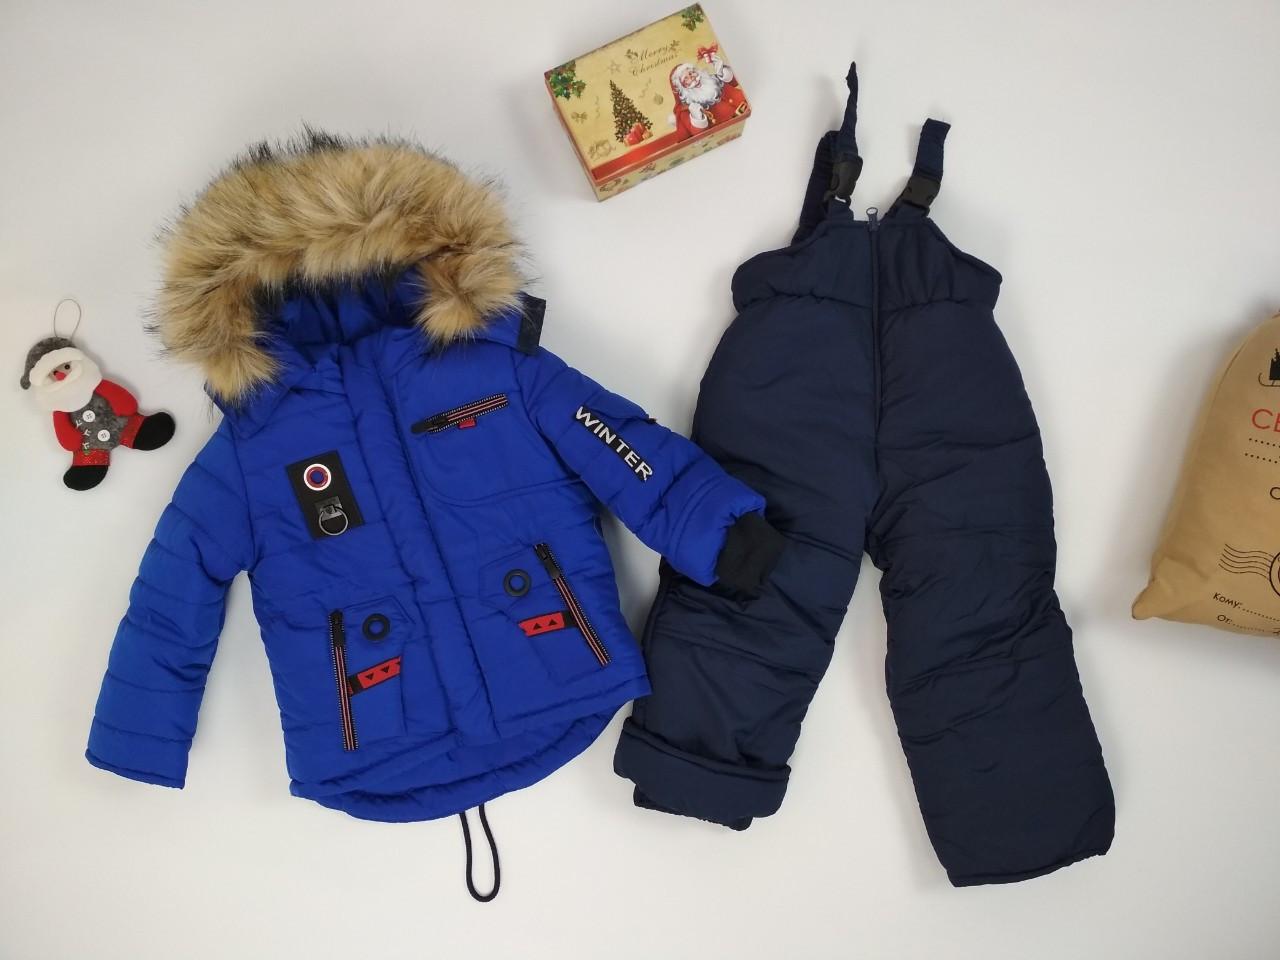 Зимний костюм куртка и комбинезон цвет электрик для мальчика 86-116 р, фото 1